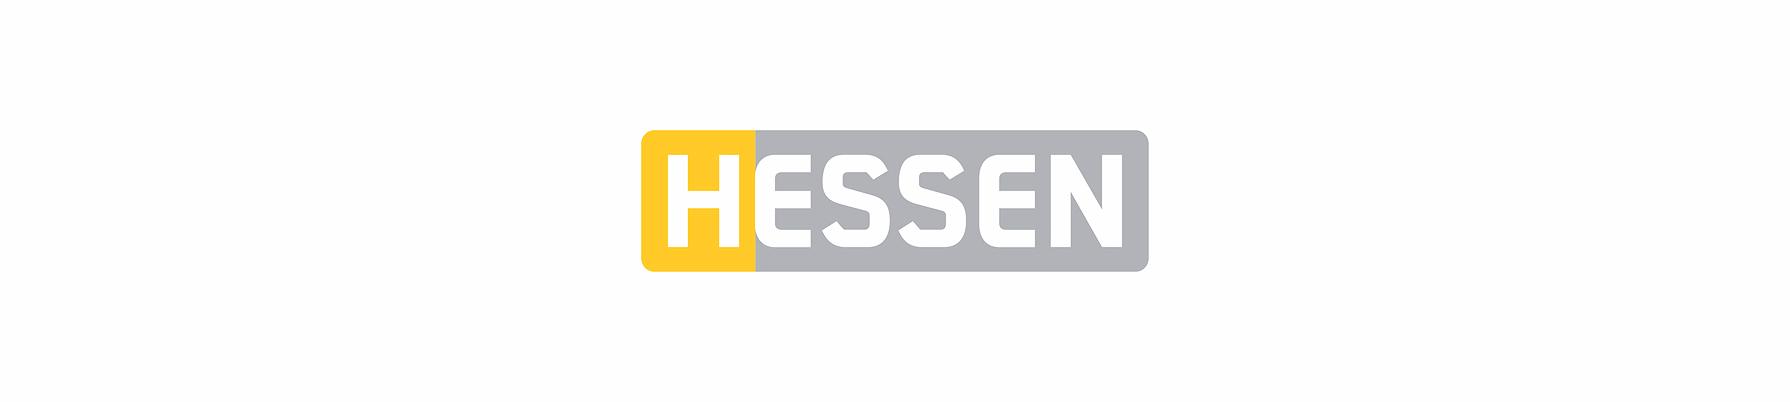 logo Hessen est design studio